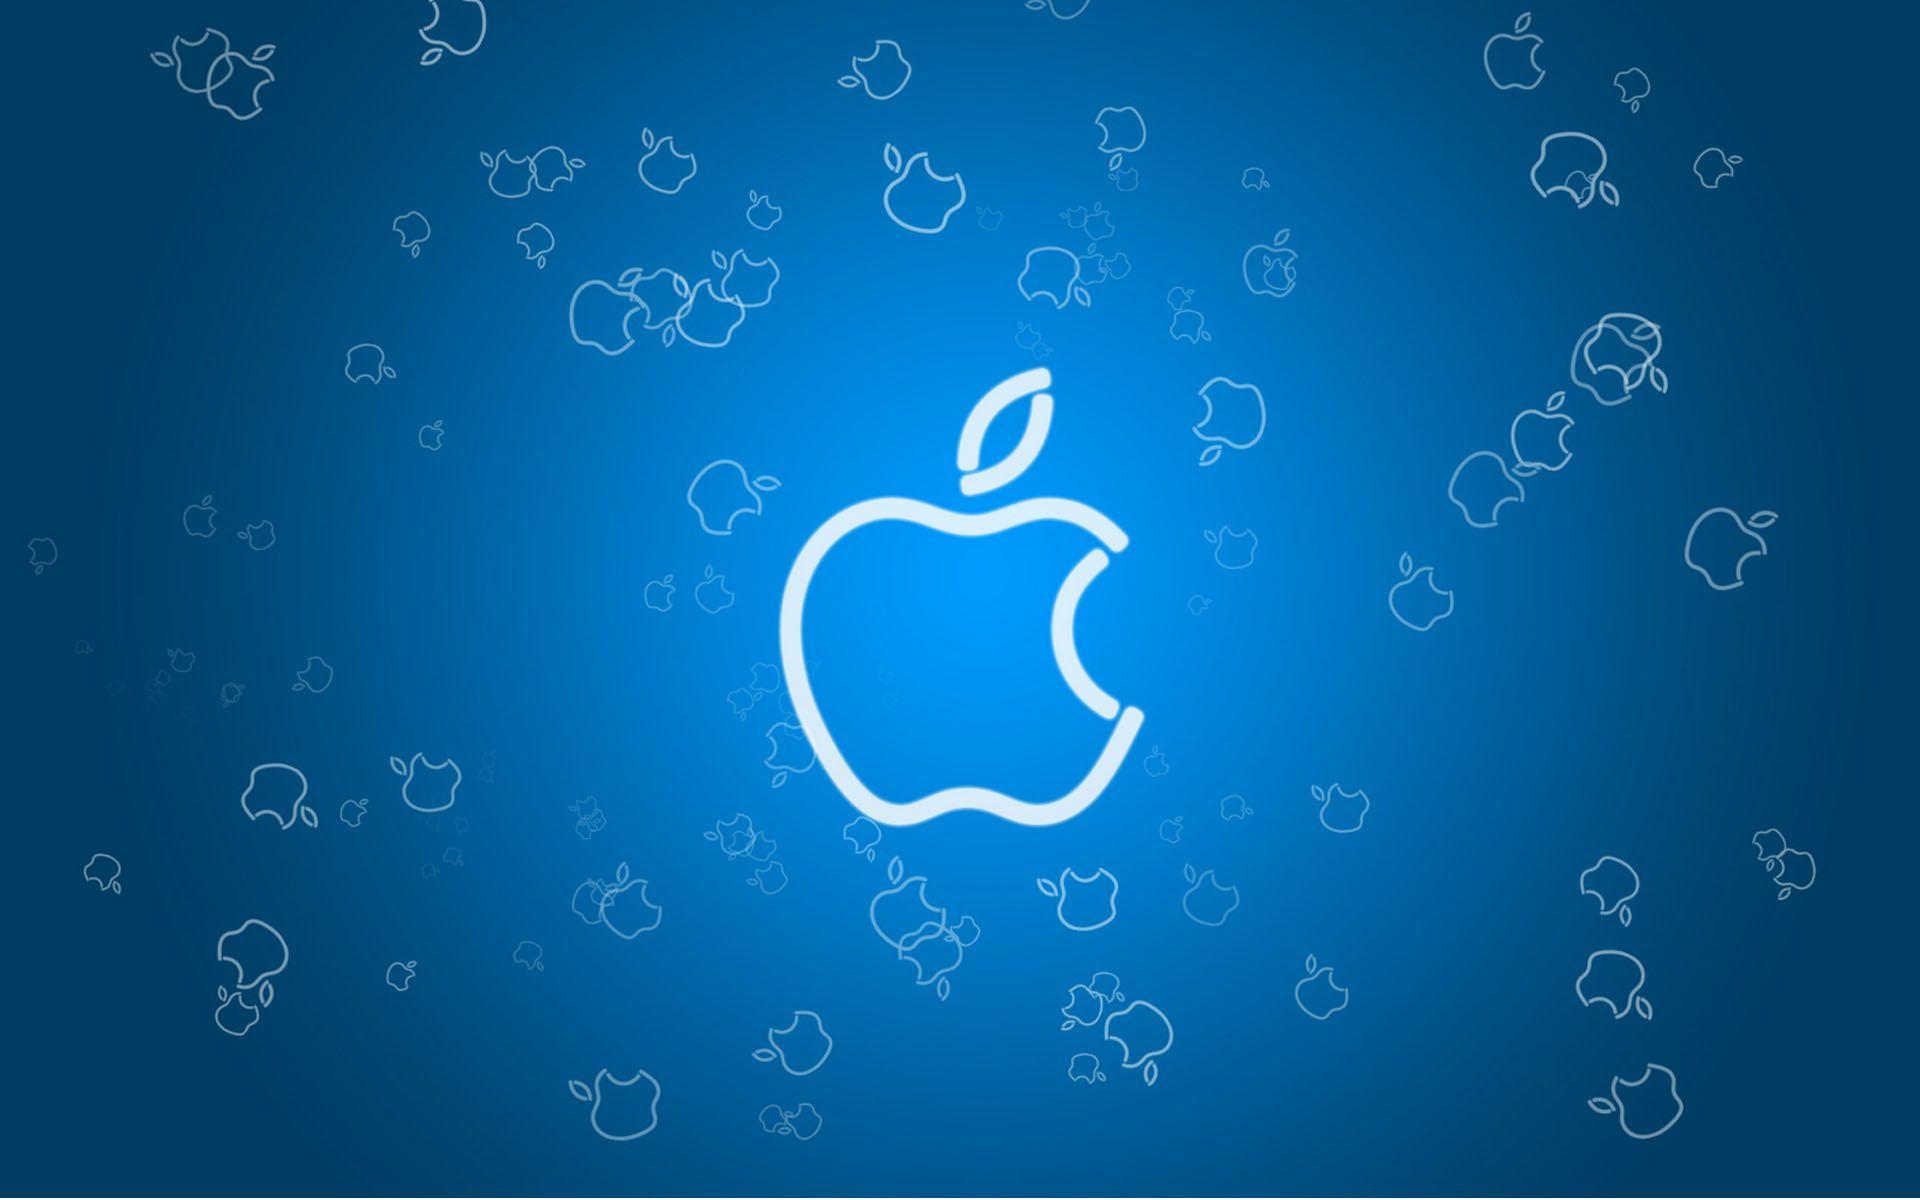 apple mac background wallpaper | coisas para usar | pinterest